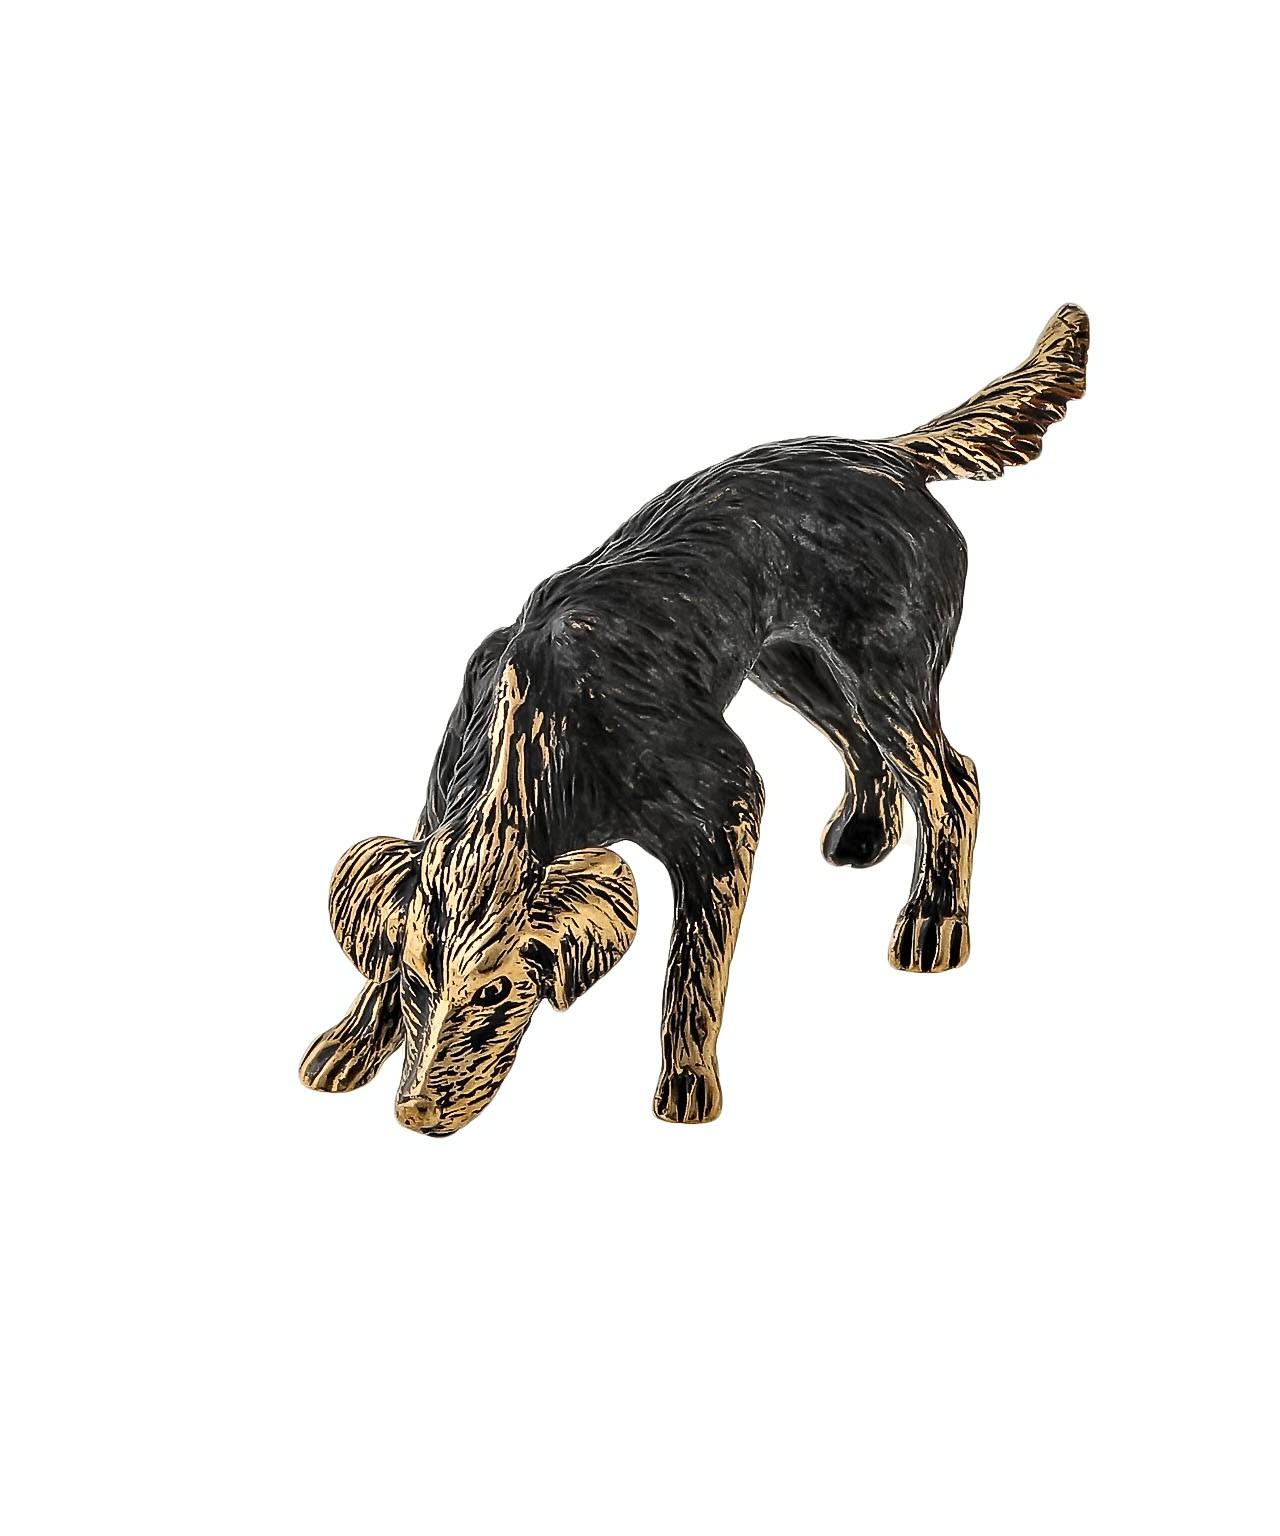 Собака Охотничья без подставки 1523.1